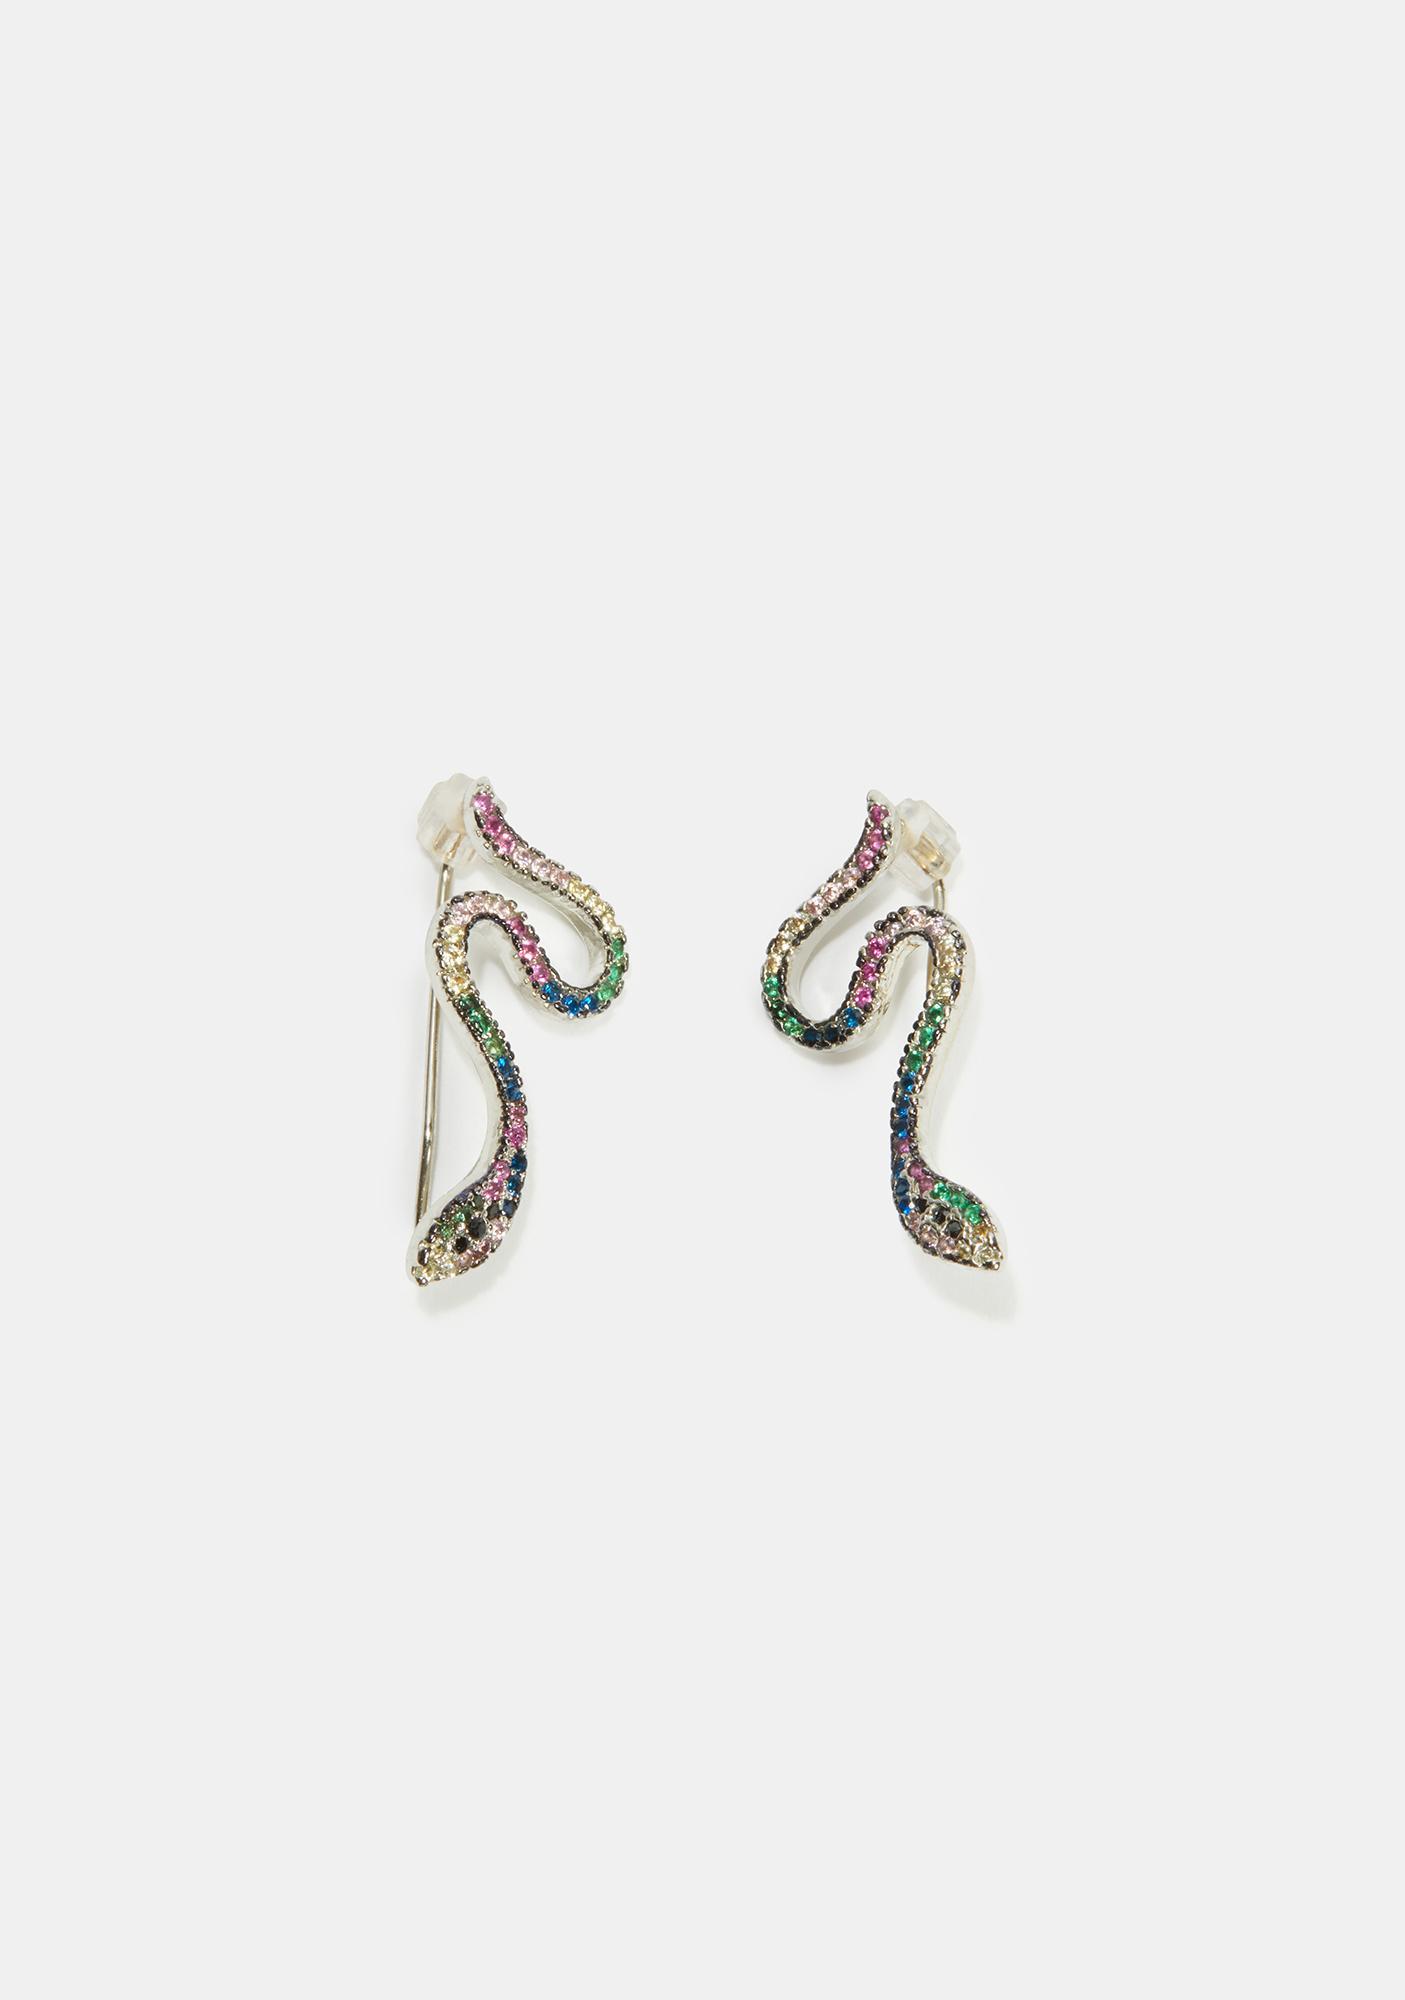 Vicious Cycle Rhinestone Earrings